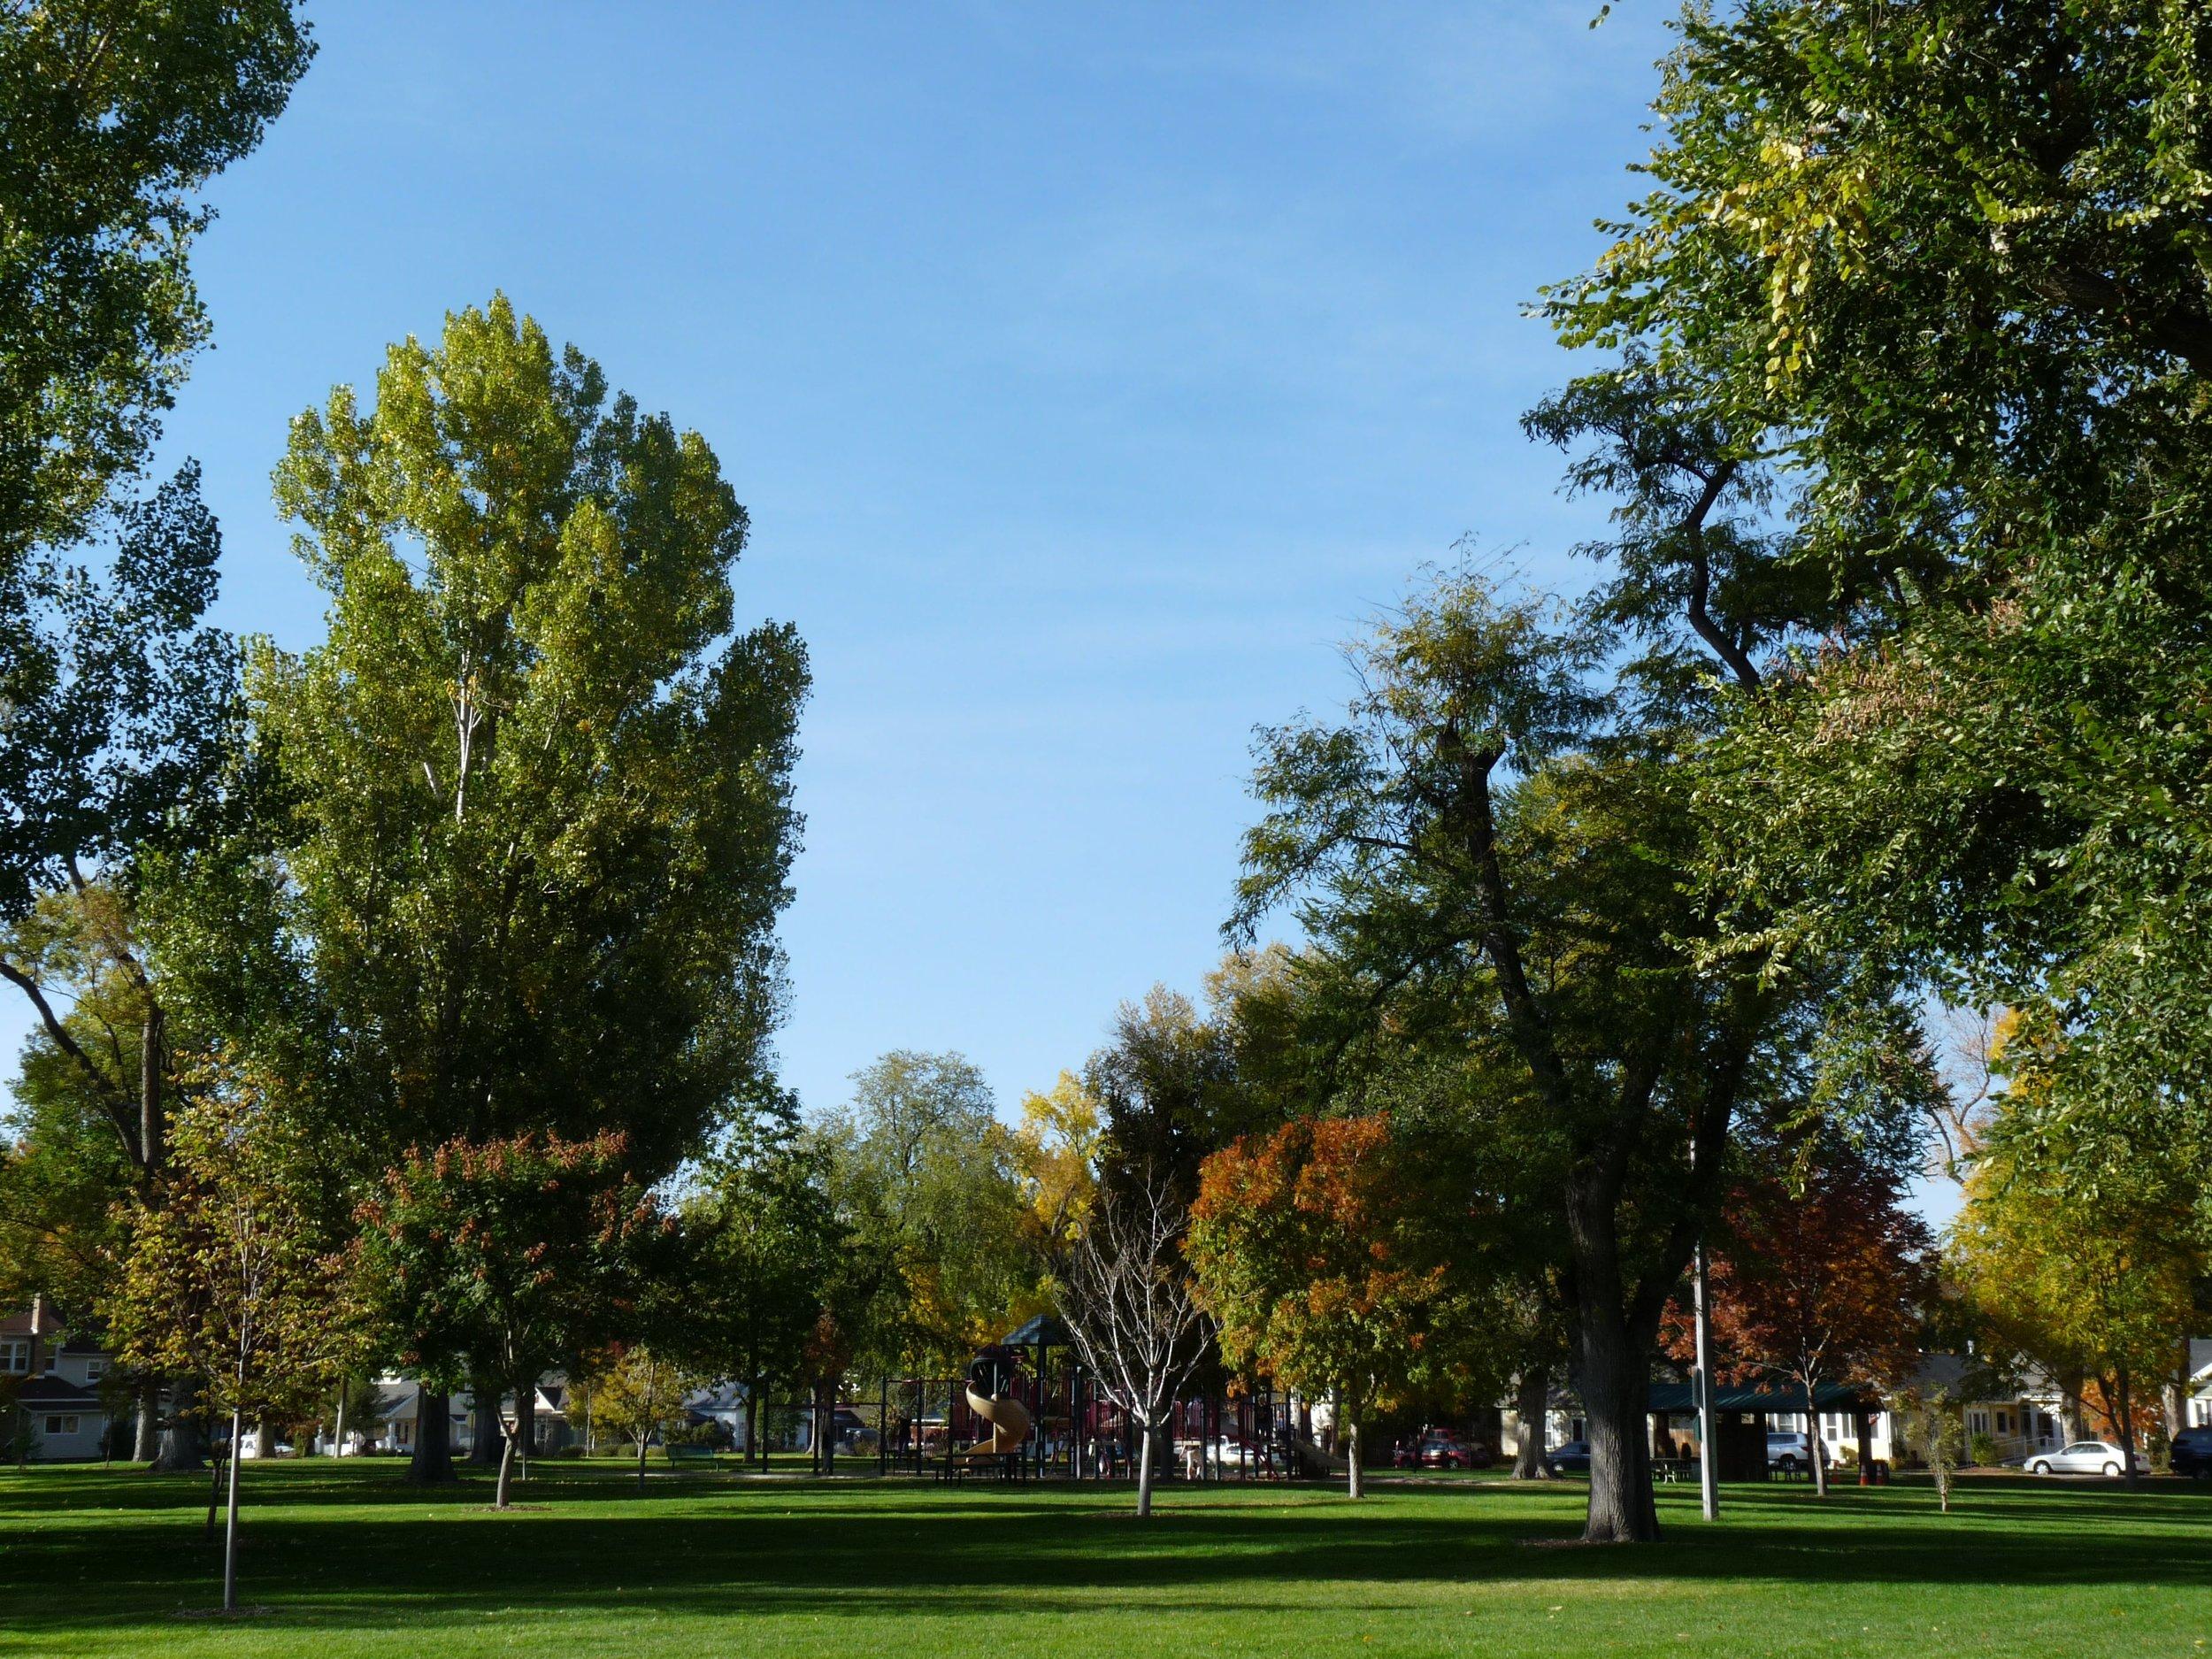 Main_Park_2_-_Windsor_CO-min.jpg